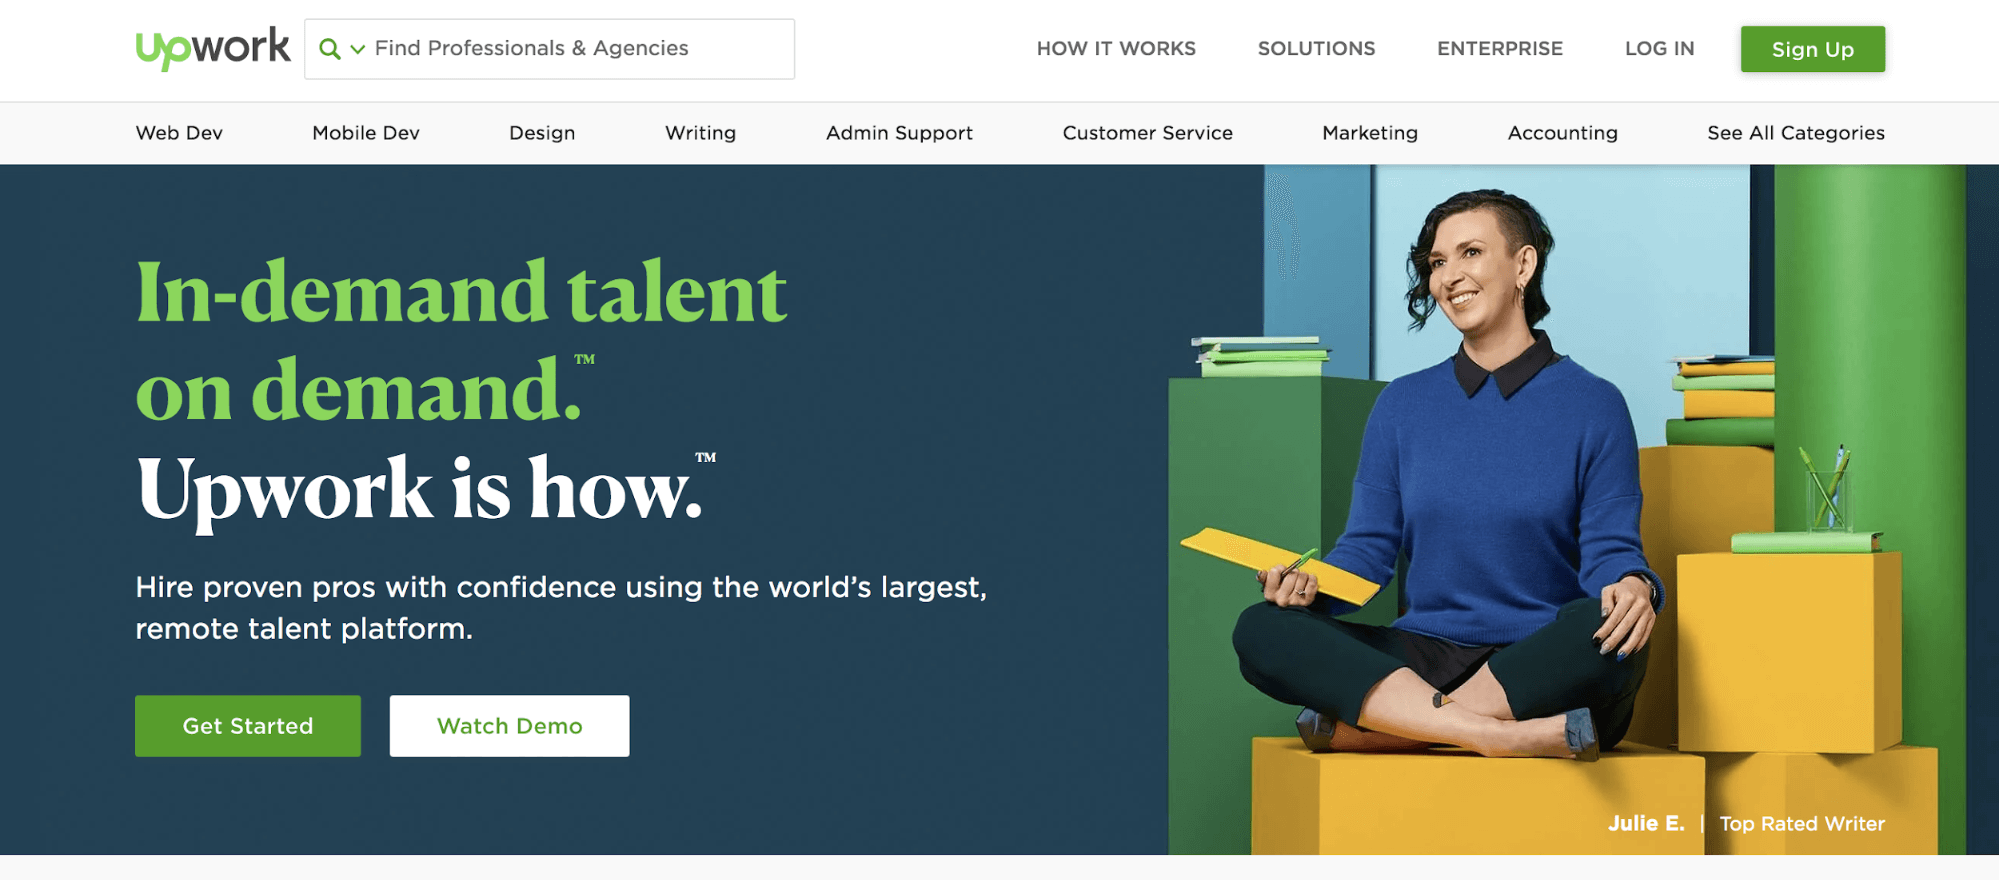 marketing independiente: sitio web Upwork